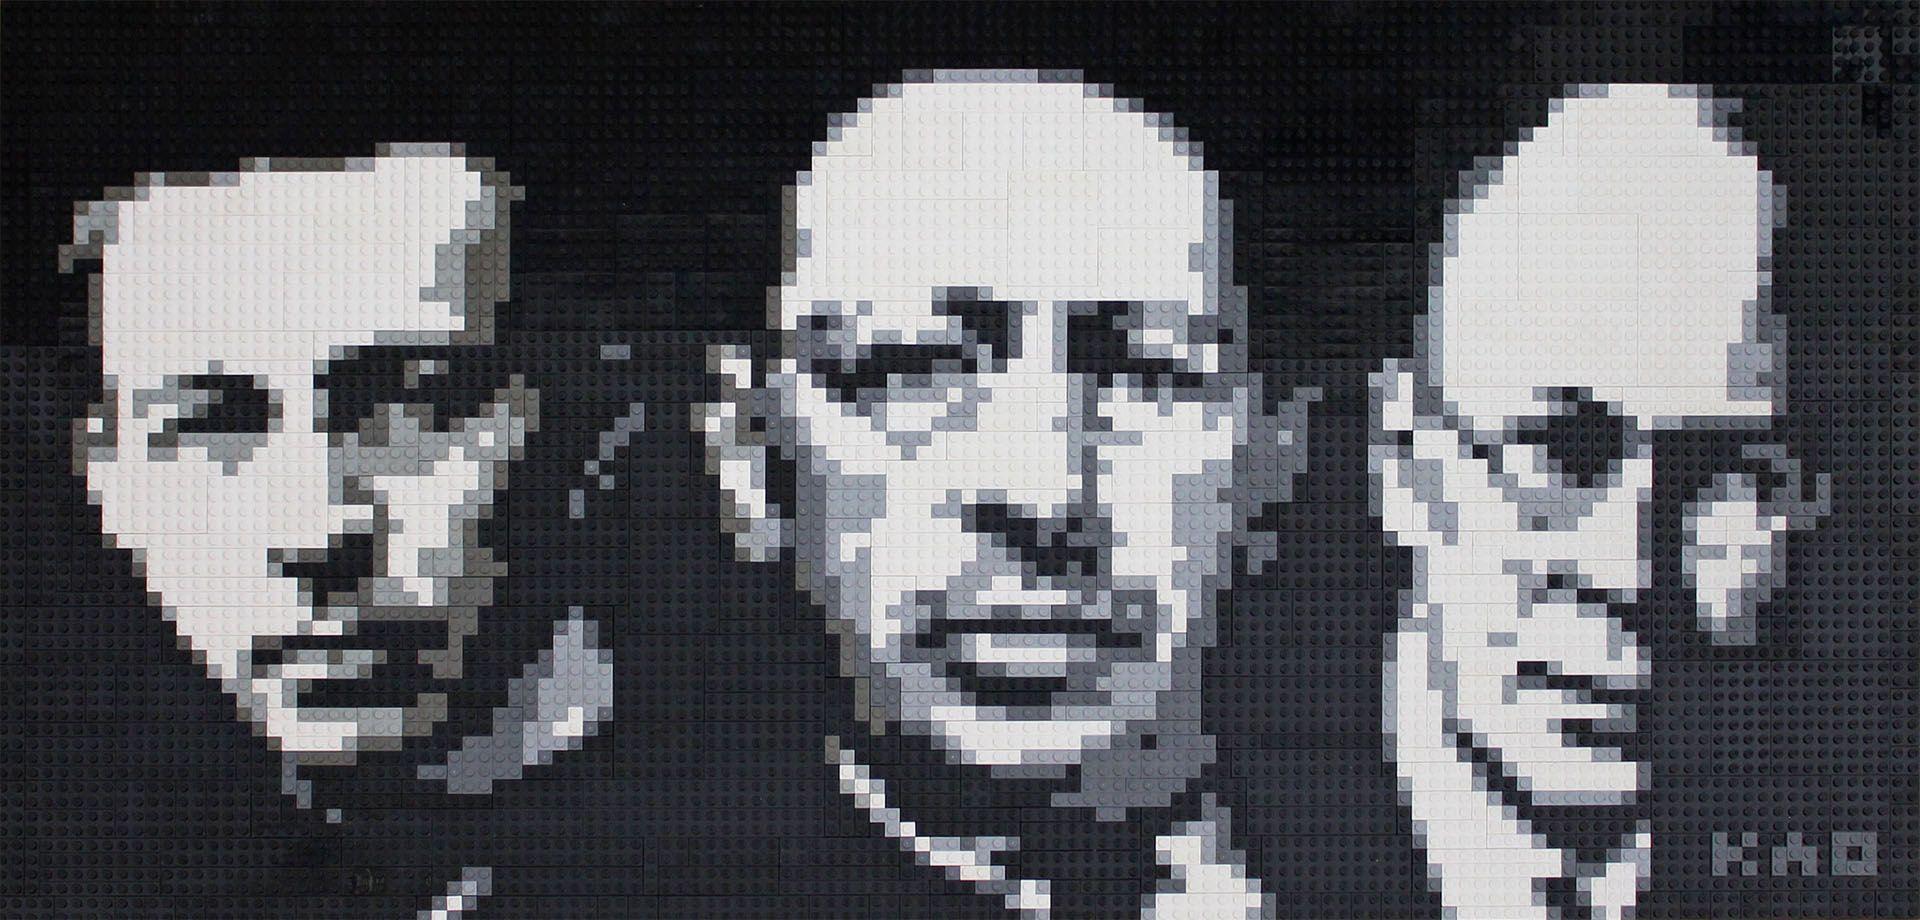 Rachmaninoff, Stravinsky, and Prokofiev Lego Mosaic